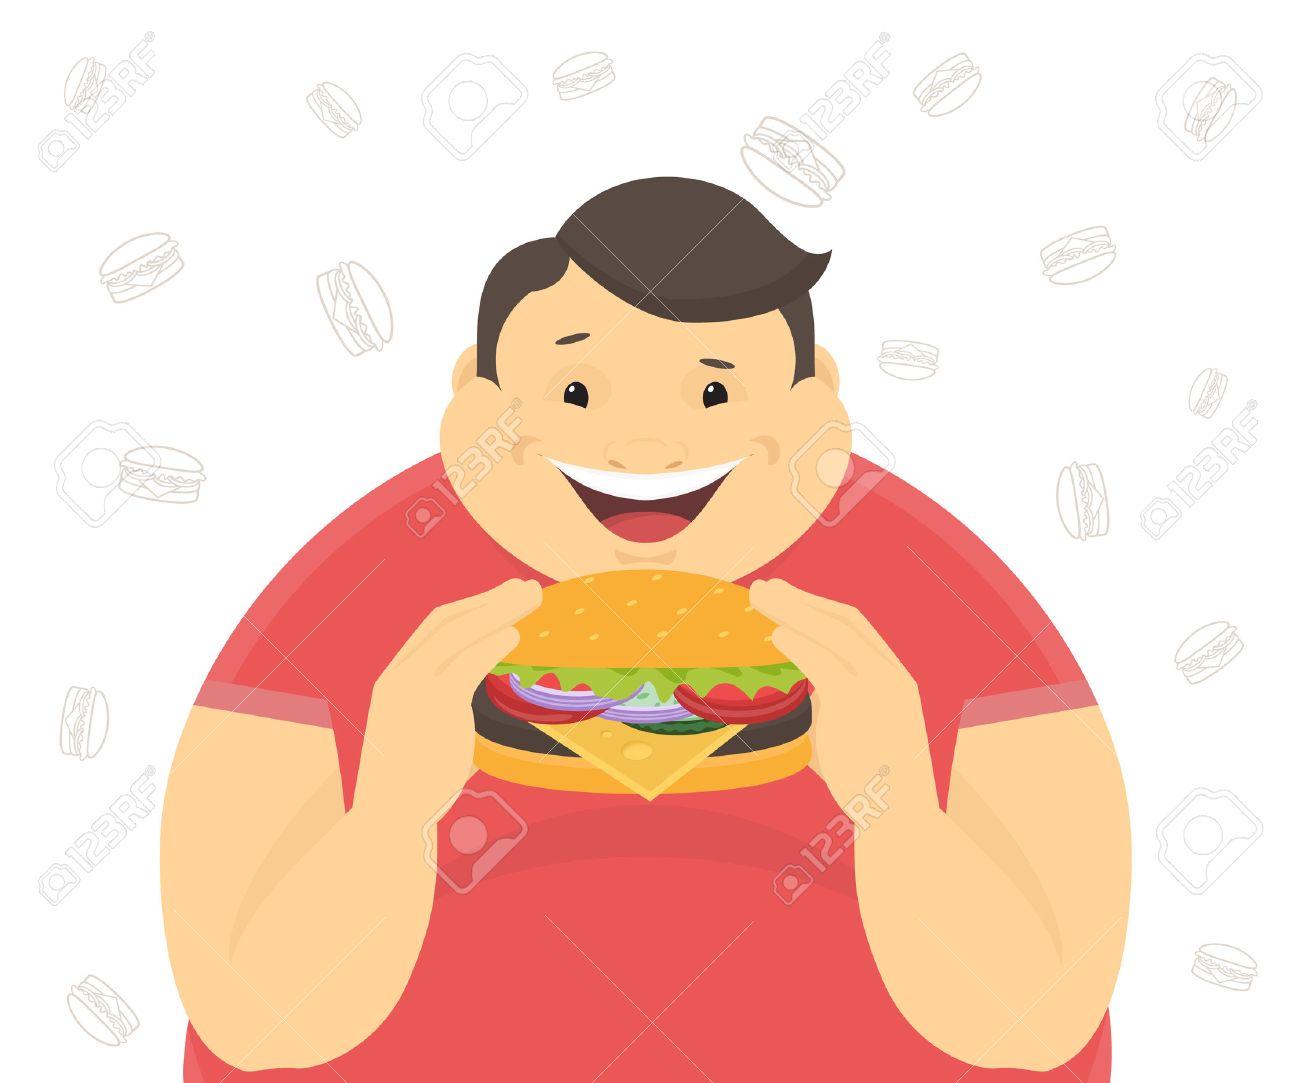 Happy fat man eating a big hamburger. Flat concept illustration of bad habits isolated on white background with contour burger symbols - 50067863